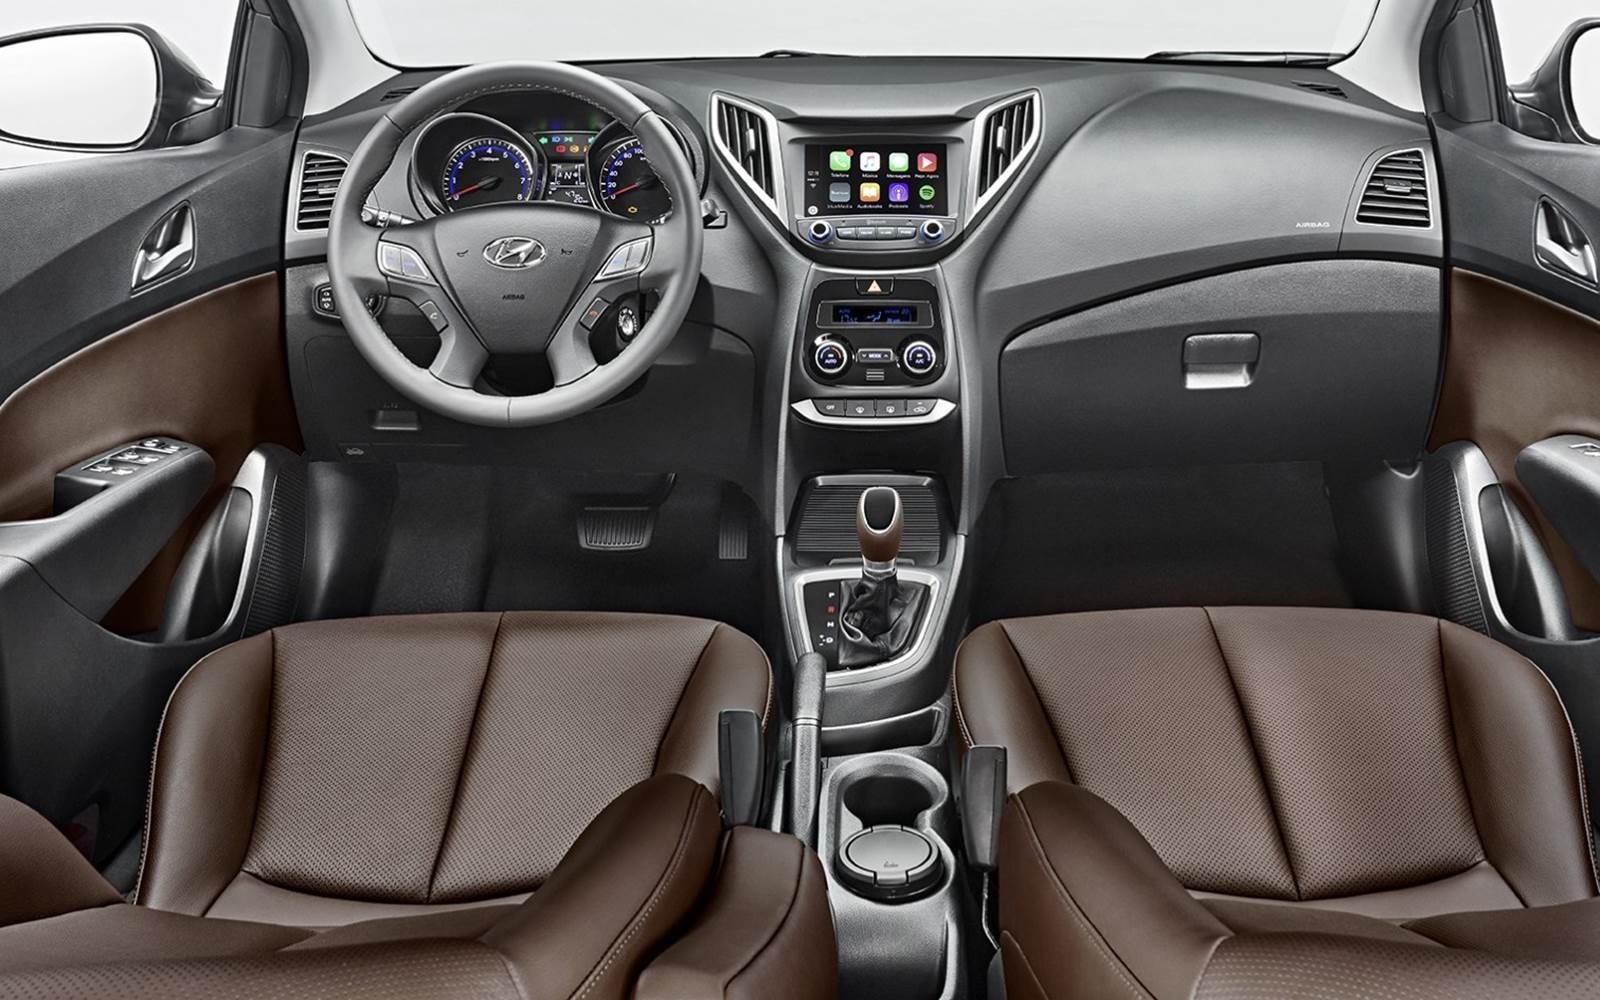 Hyundai HB20 2016 - interior